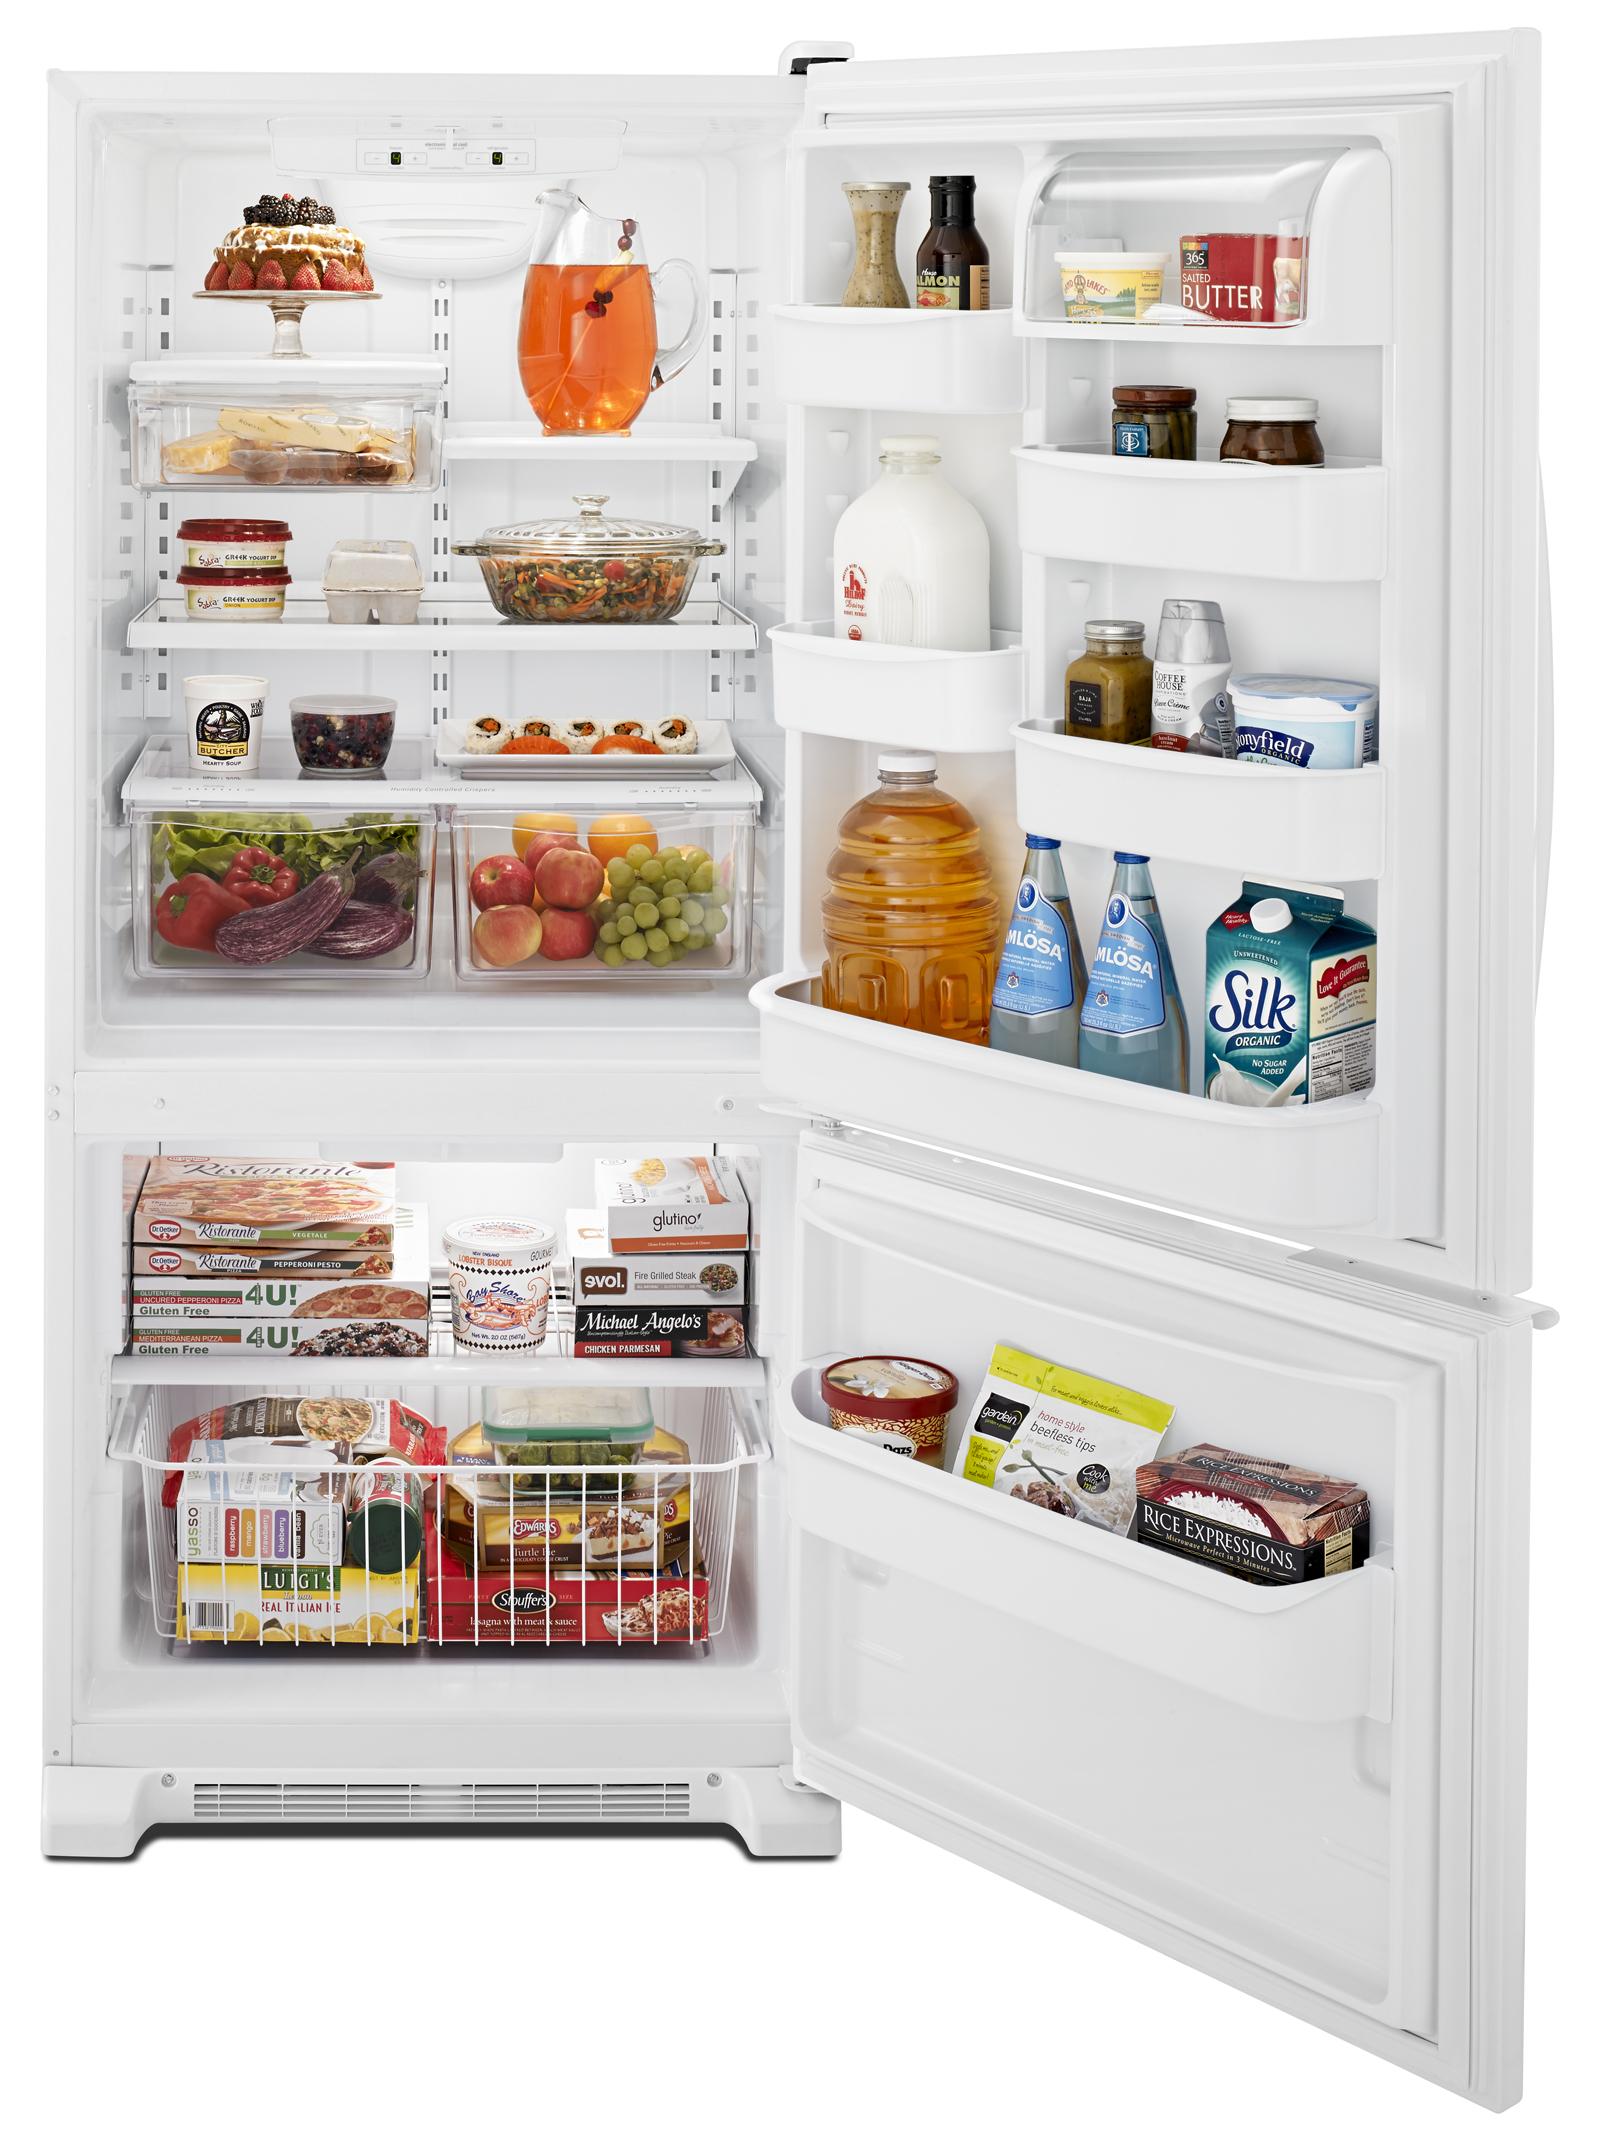 Whirlpool WRB119WFBW 19 cu. ft. Single Door Bottom Freezer Refrigerator w/ Adaptive Defrost - White